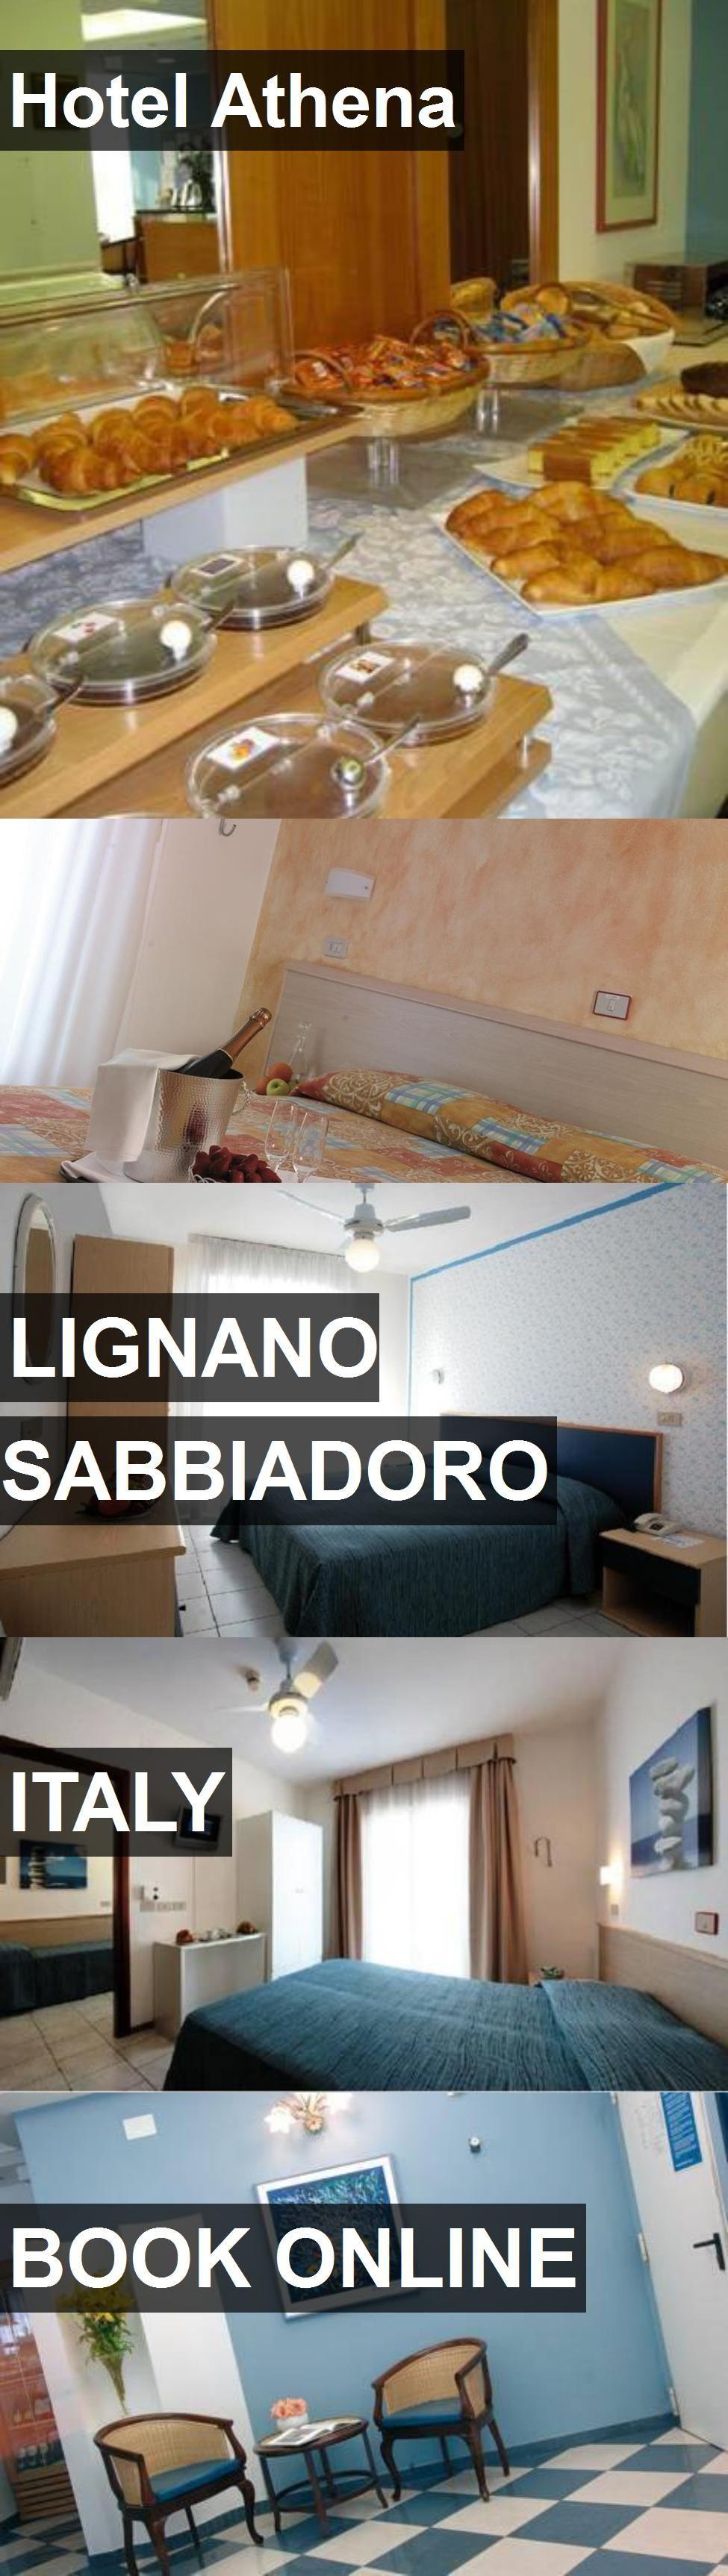 Hotel Athena in Lignano Sabbiadoro, Italy. For more